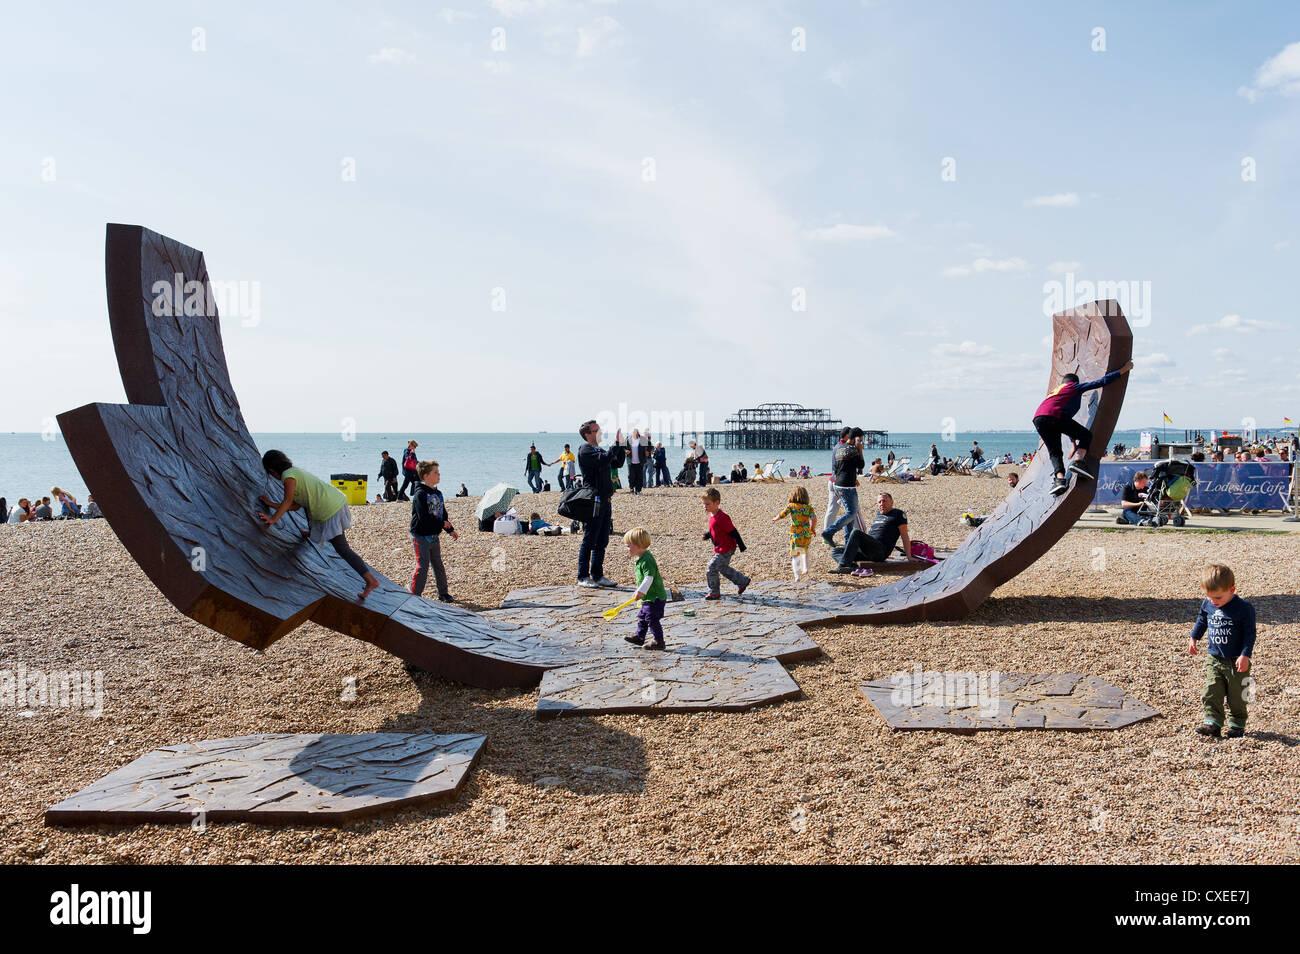 Children playing on the iron sculpture Passacaglia on Brighton beach Stock Photo